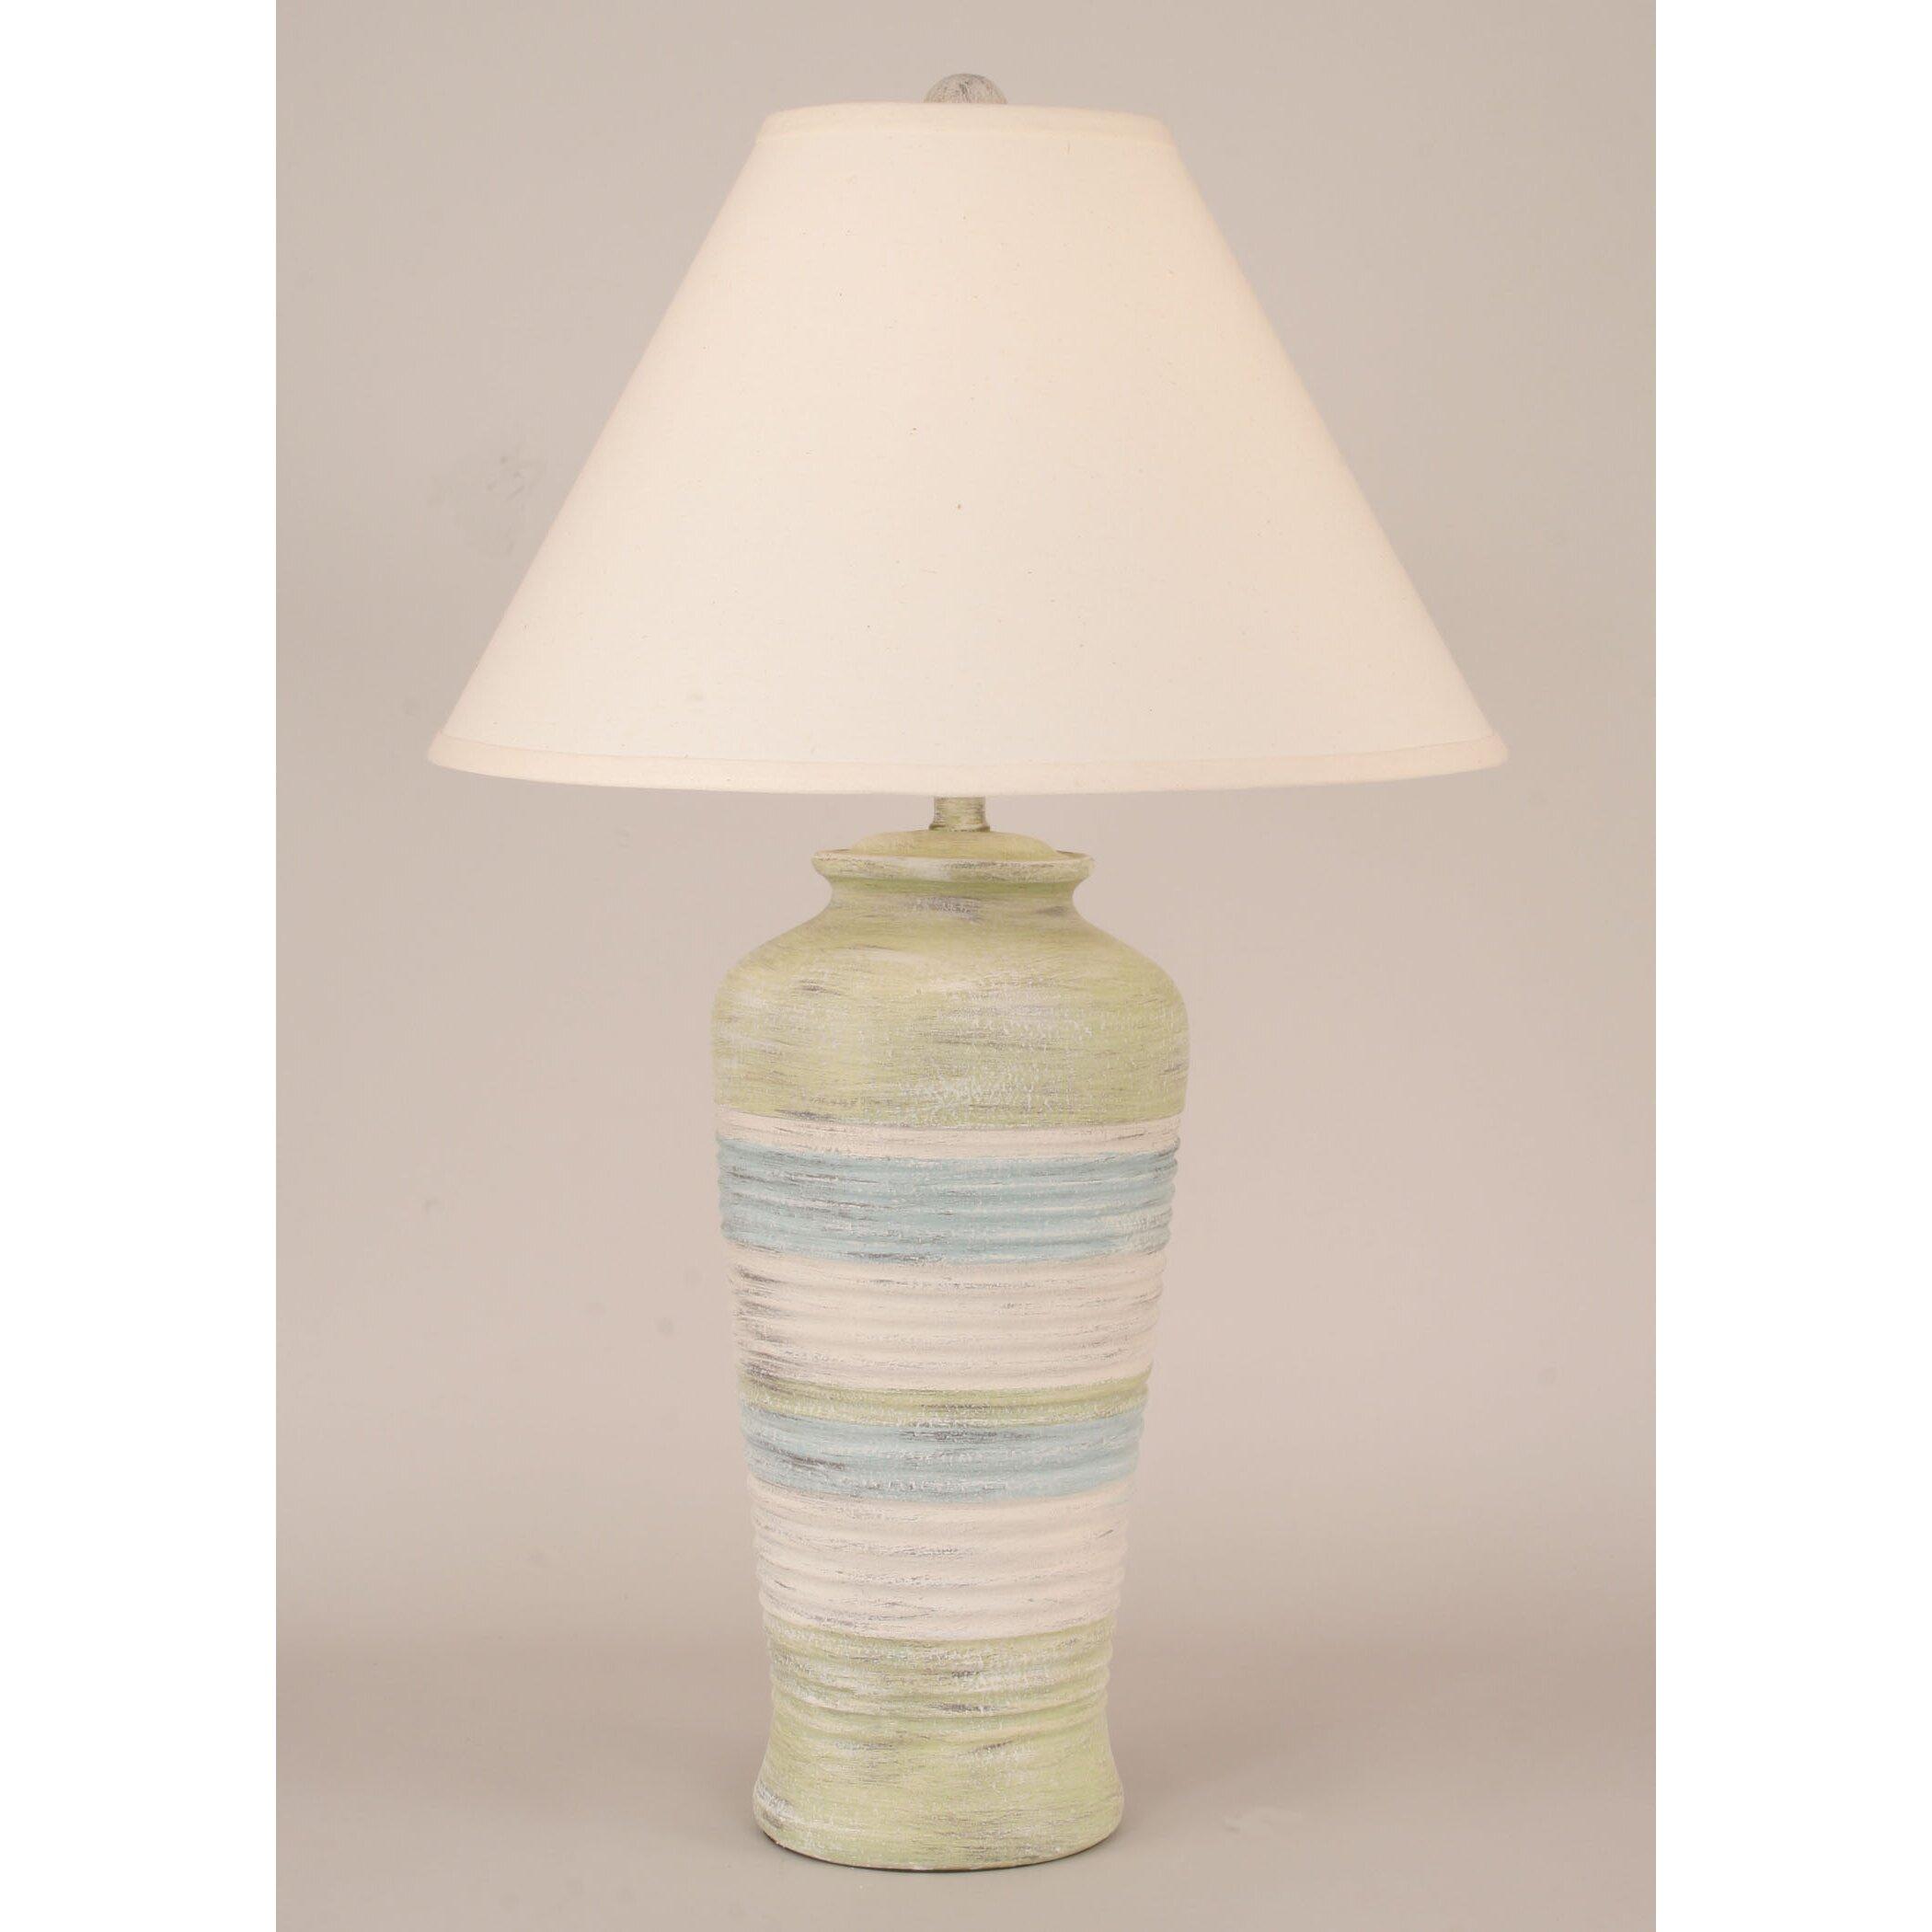 "Coastal Living Lighting: Coast Lamp Mfg. Coastal Living 29"" Table Lamp & Reviews"